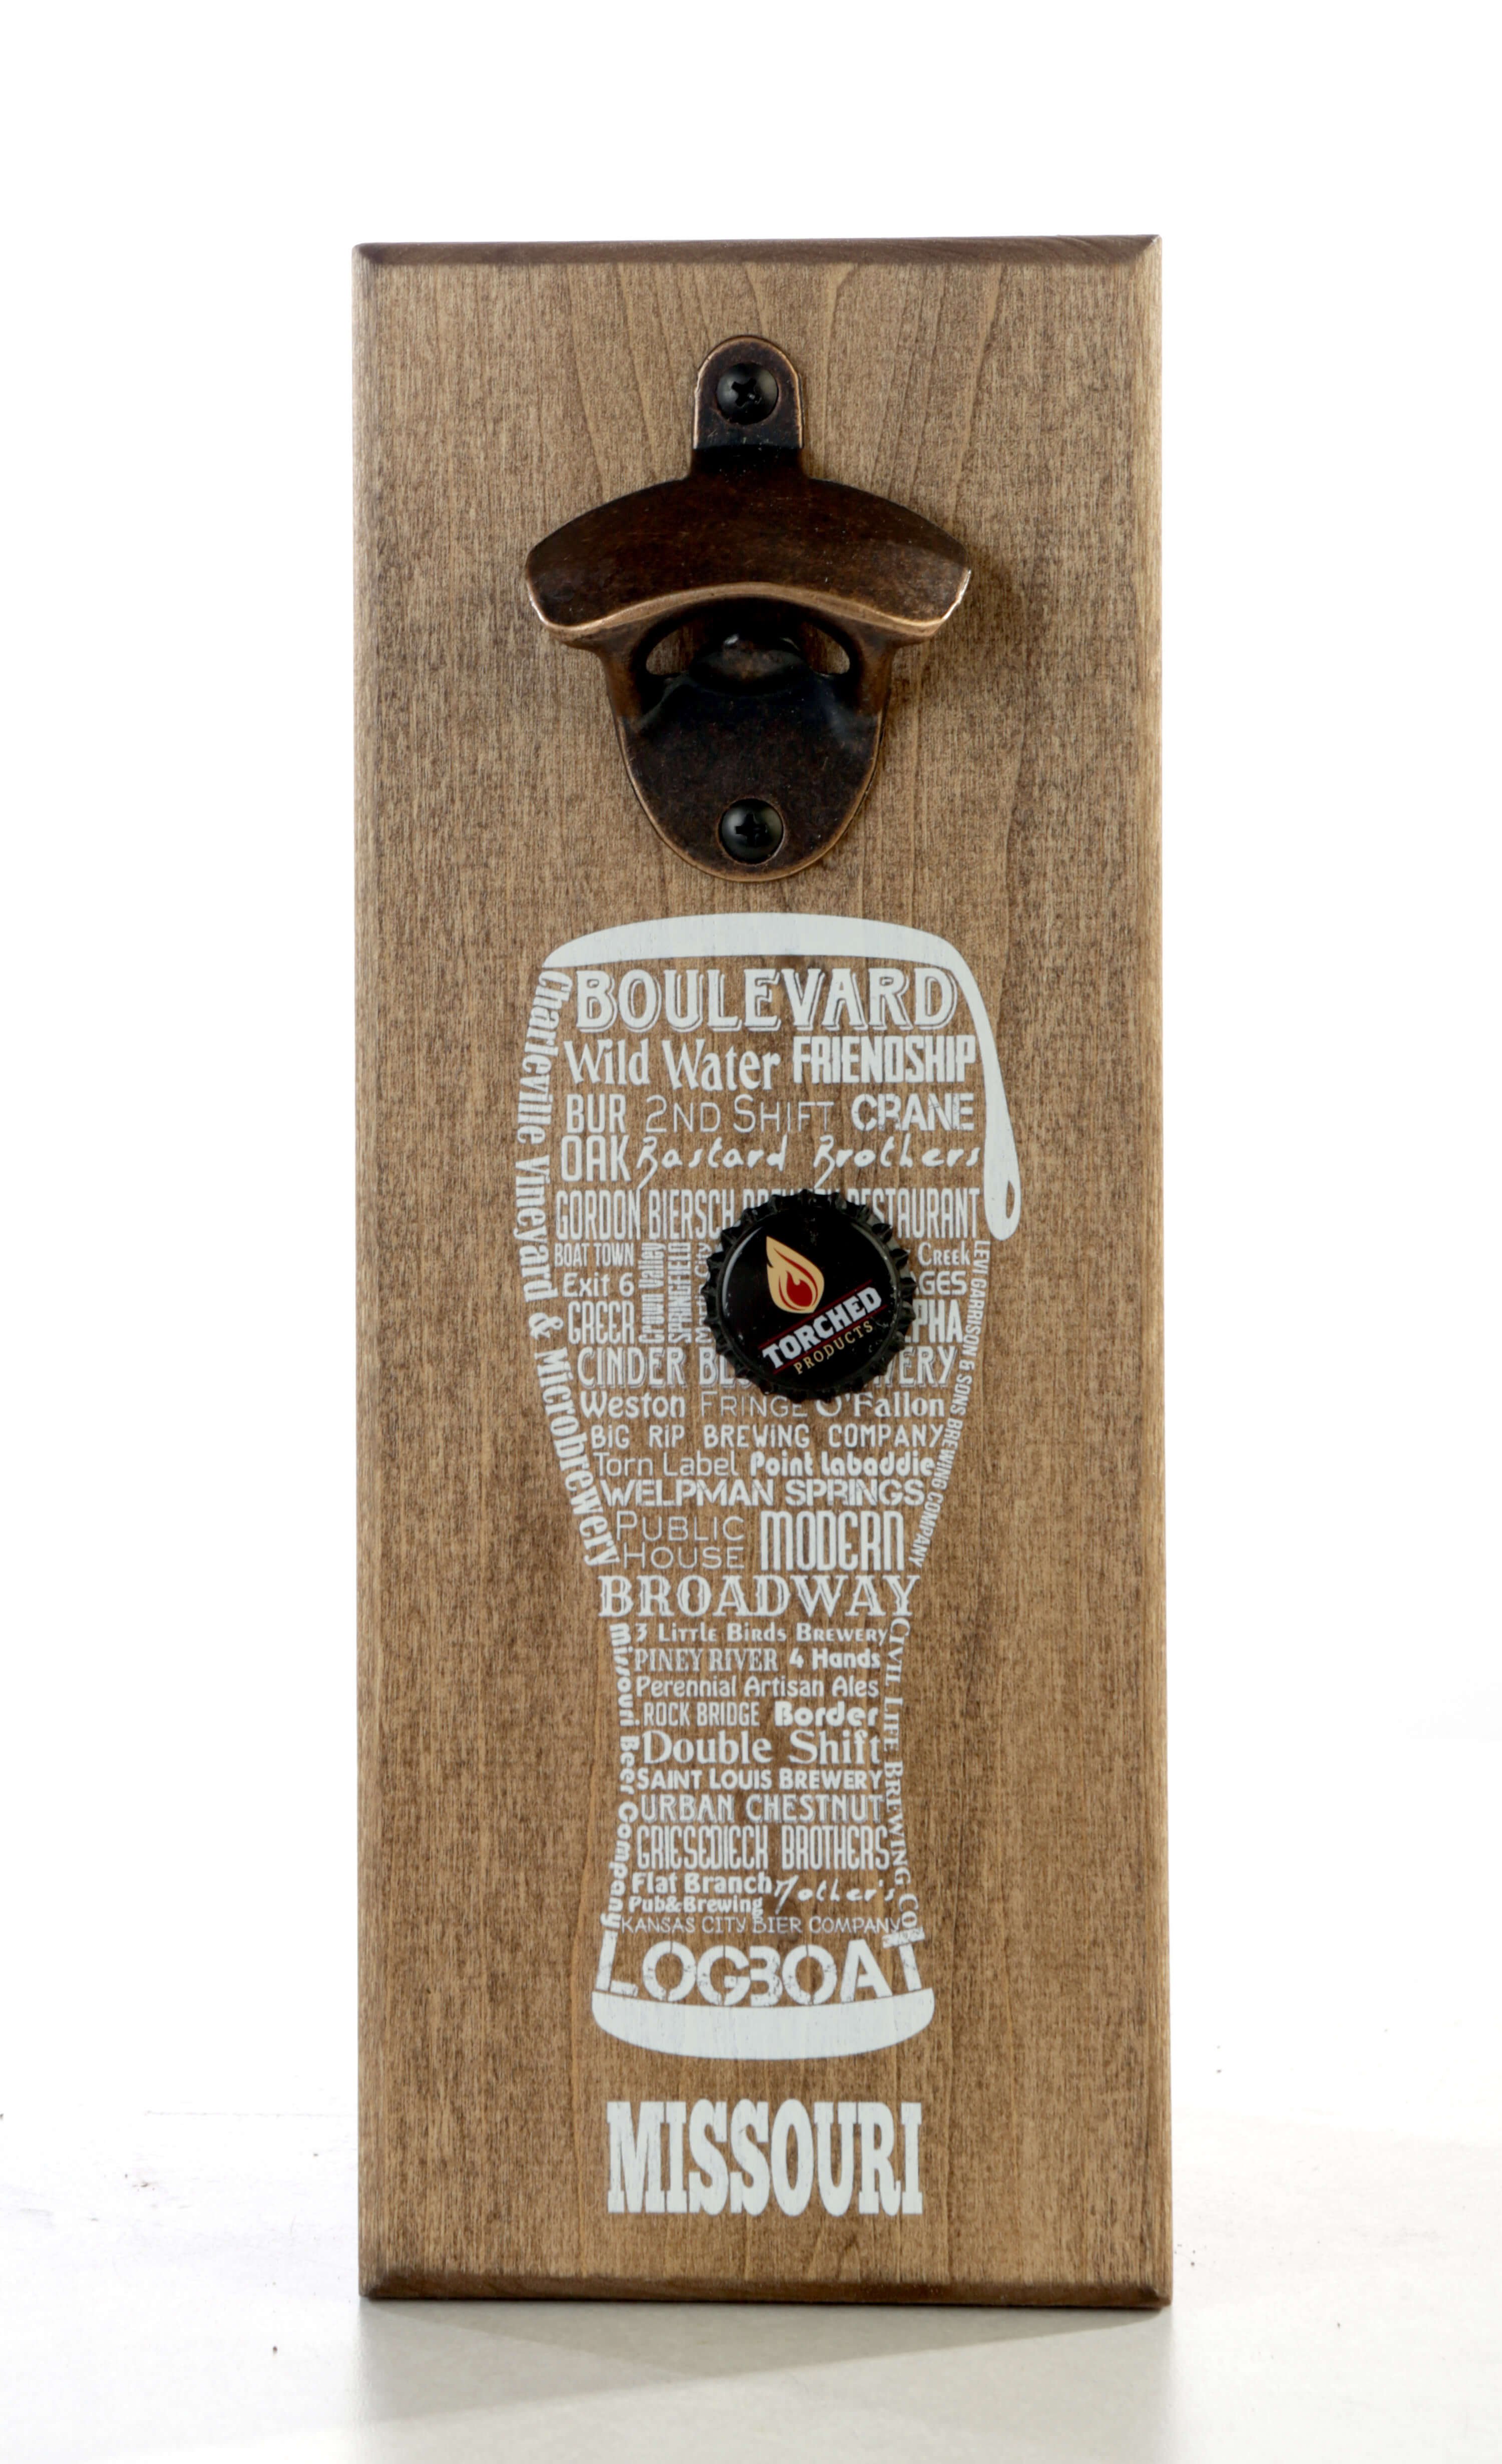 Missouri breweries bottle opener